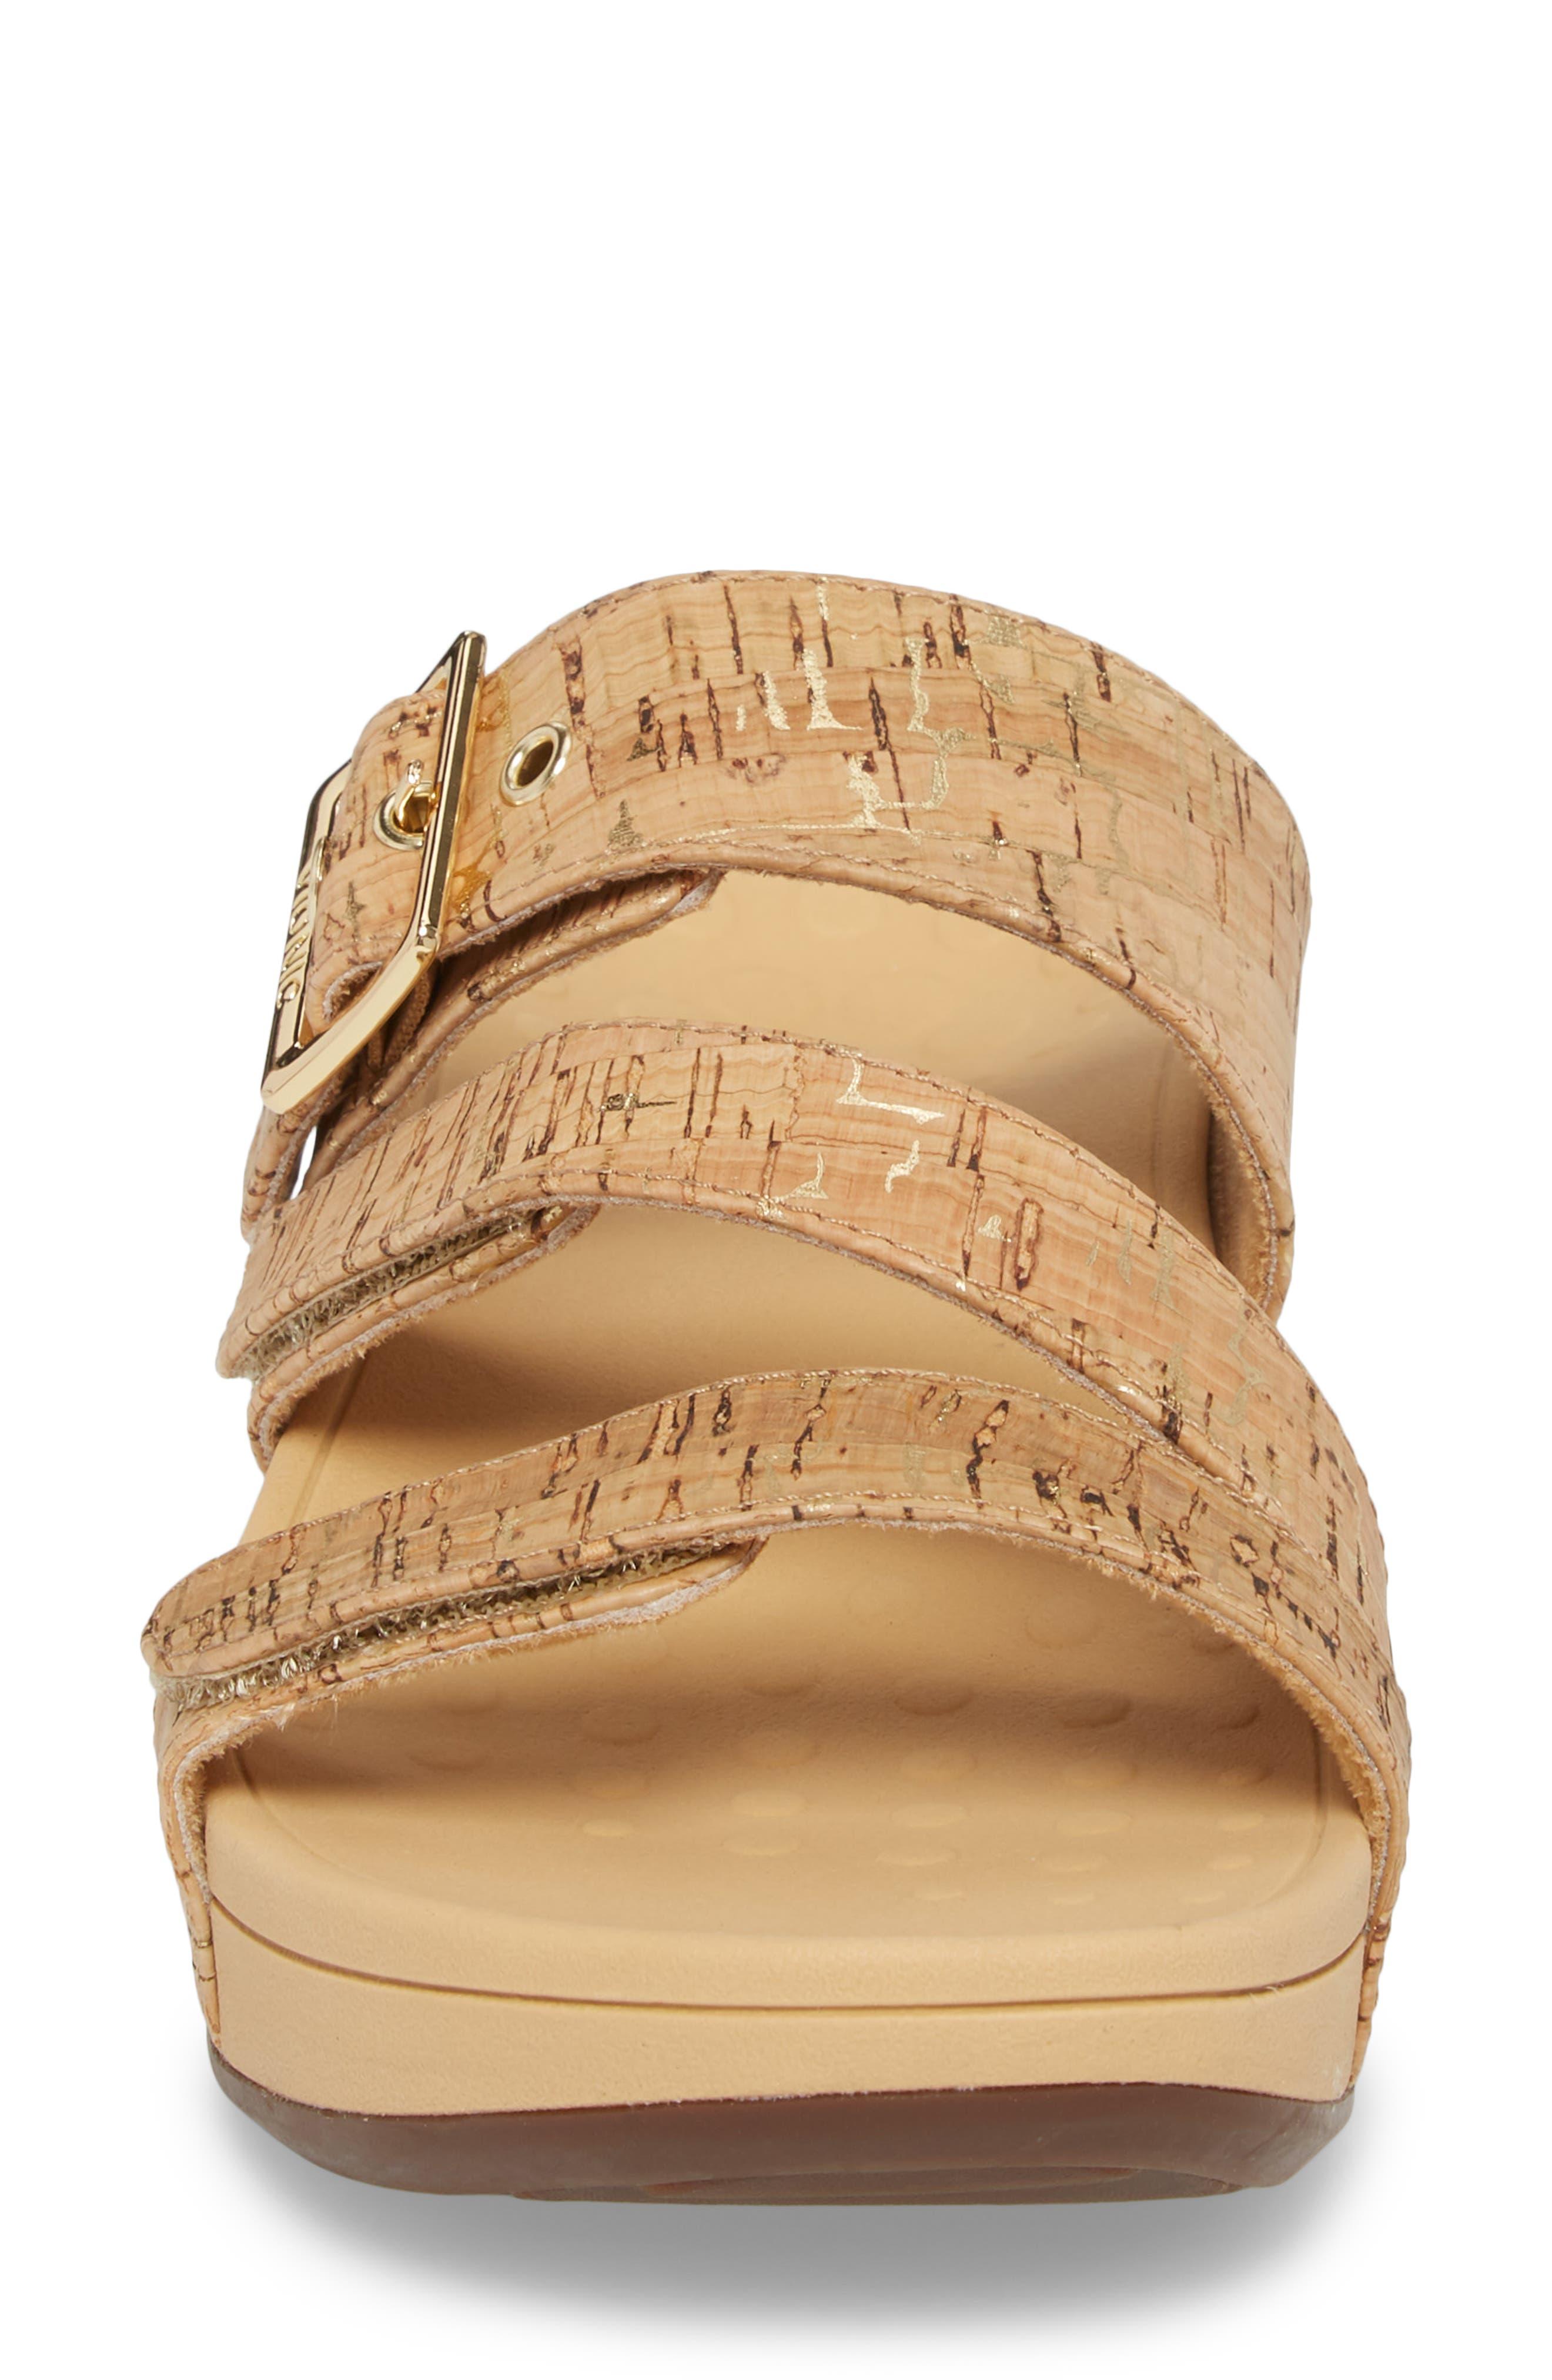 Rio Orthaheel<sup>®</sup> Slide Sandal,                             Alternate thumbnail 4, color,                             Gold Cork Fabric